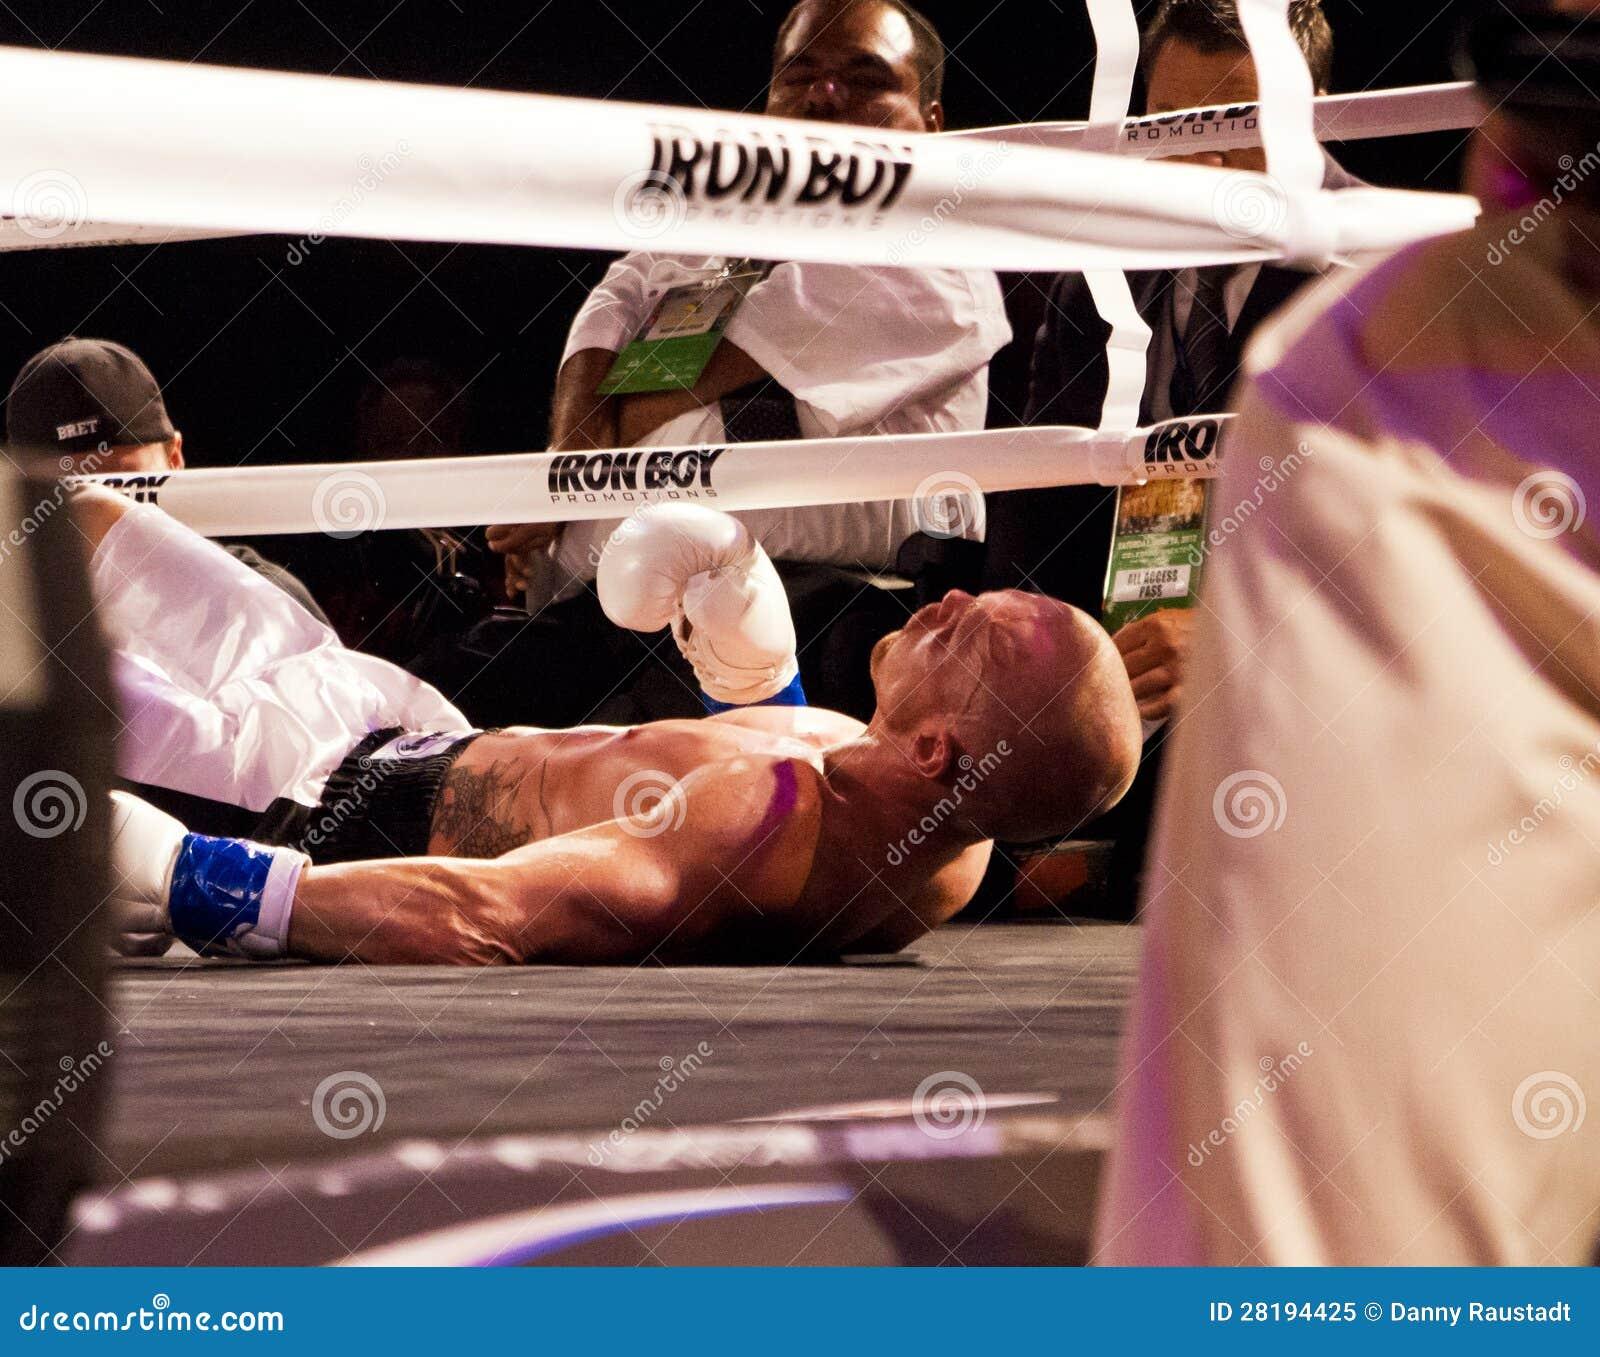 List of amateur boxers in arizona